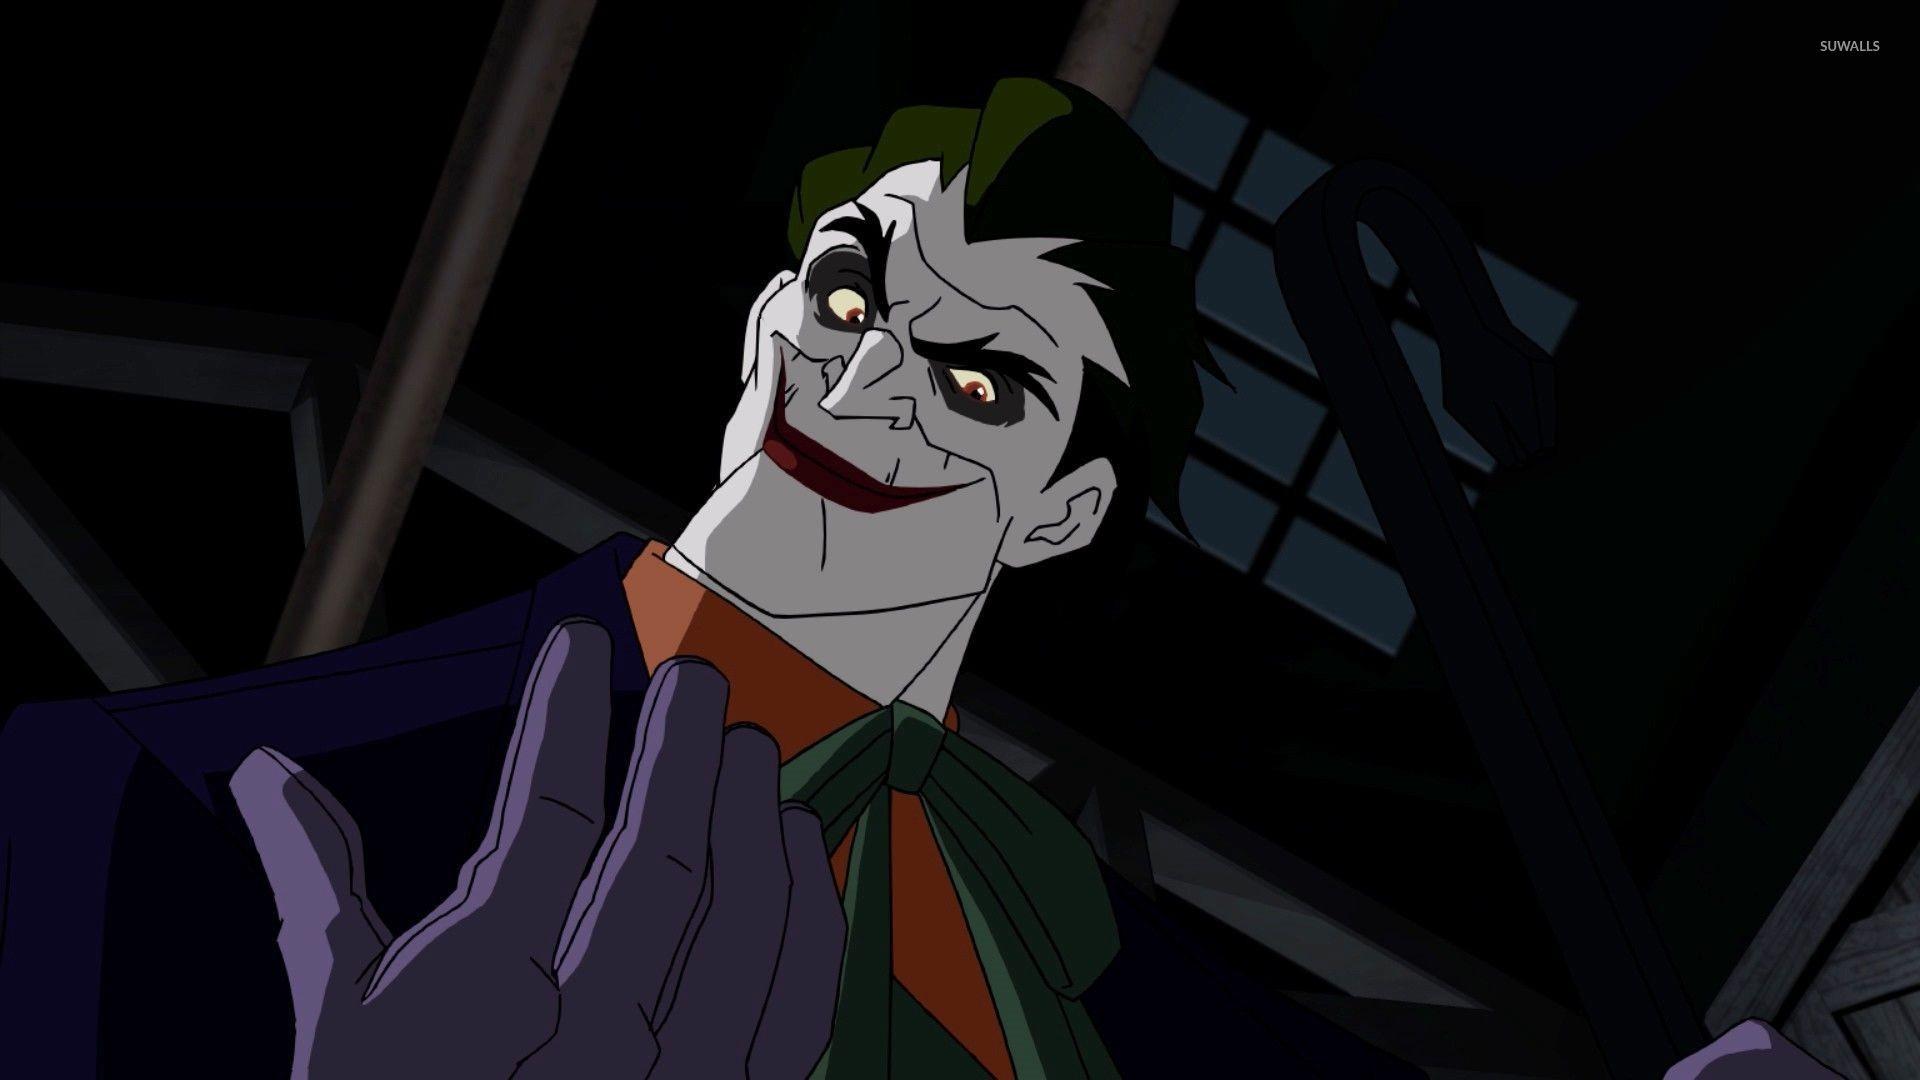 Res: 1920x1080, The Joker in Batman: Under the Red Hood wallpaper